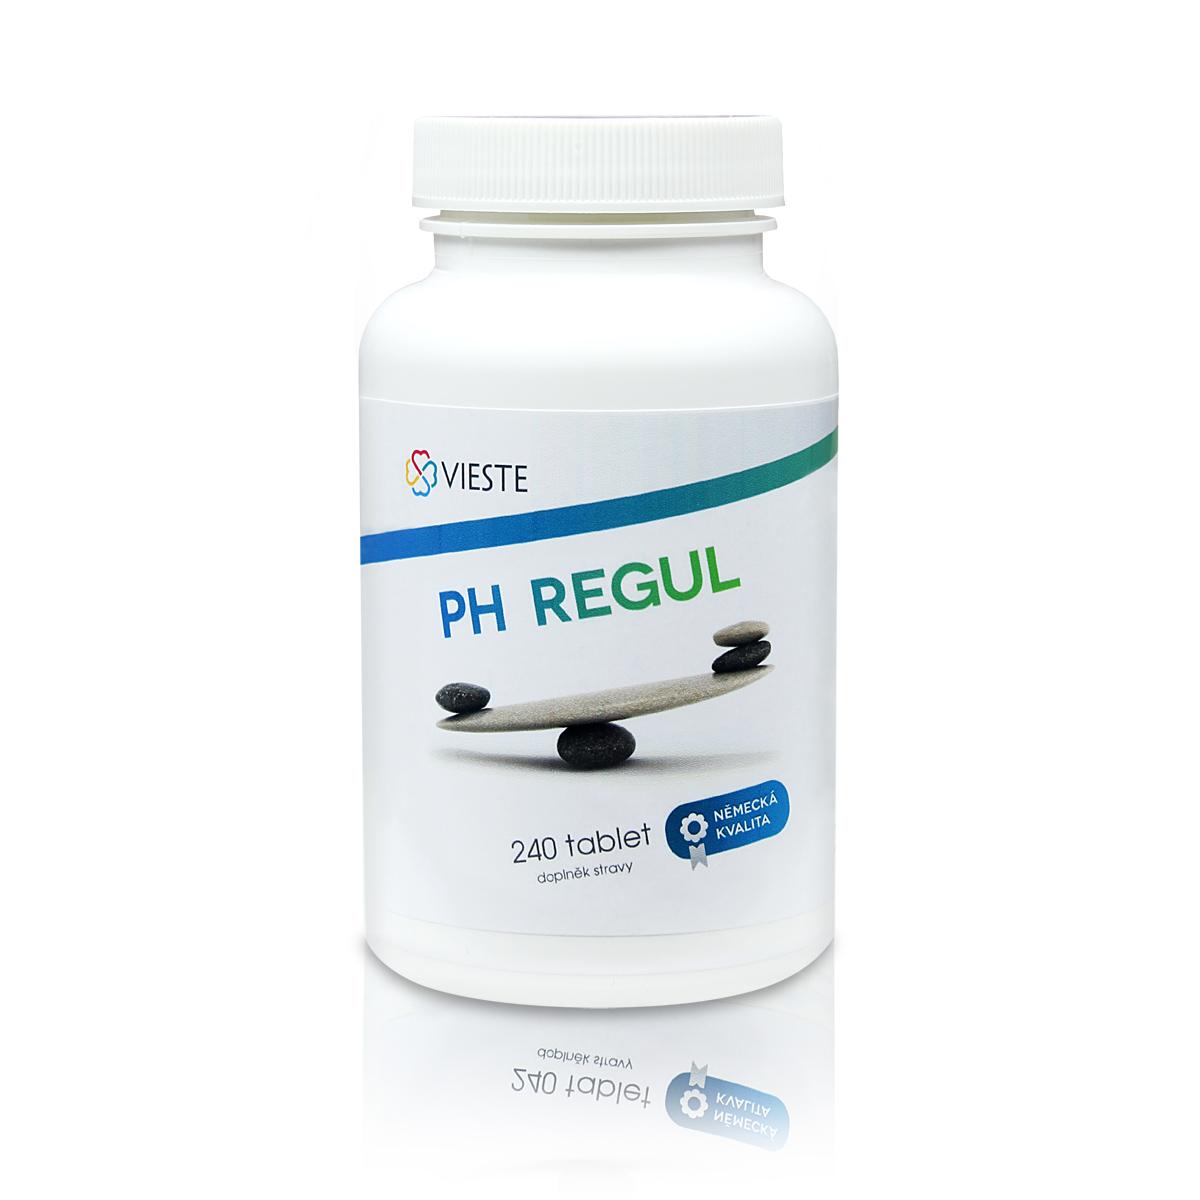 Vieste pH Regul 240 tbl